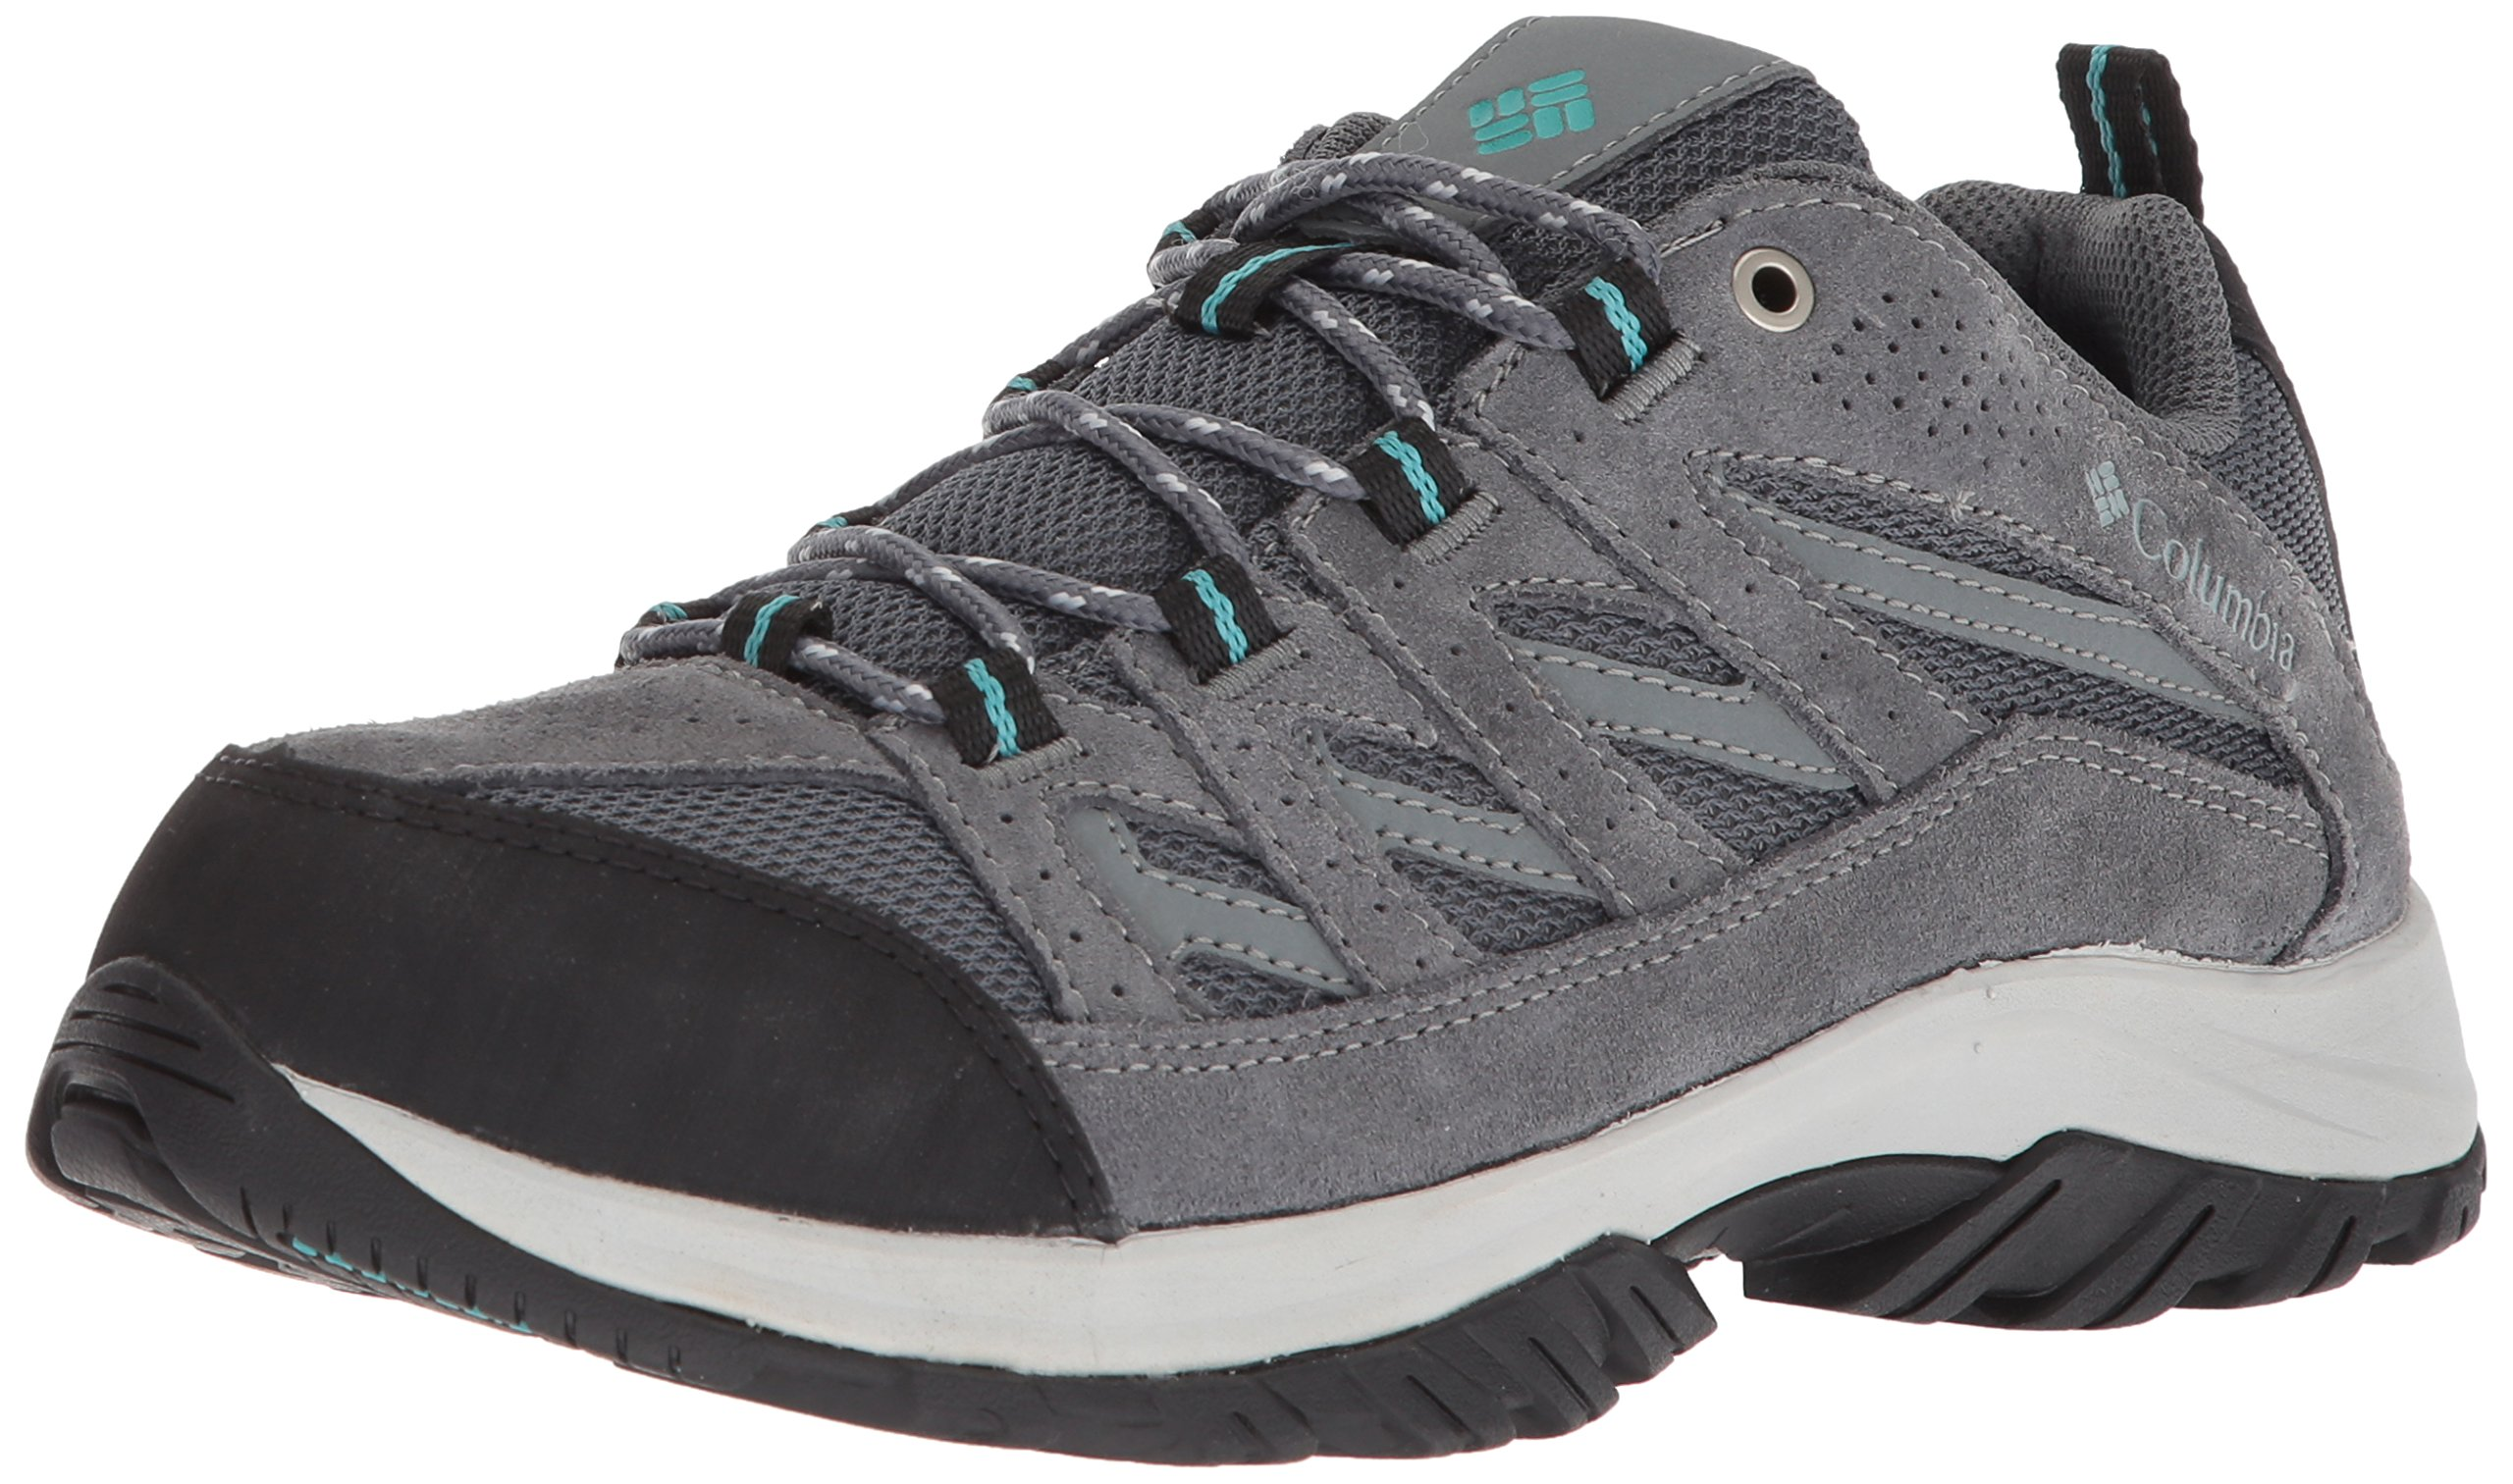 Columbia Women's Crestwood Hiking Shoe, Graphite, Pacific Rim, 7 B US